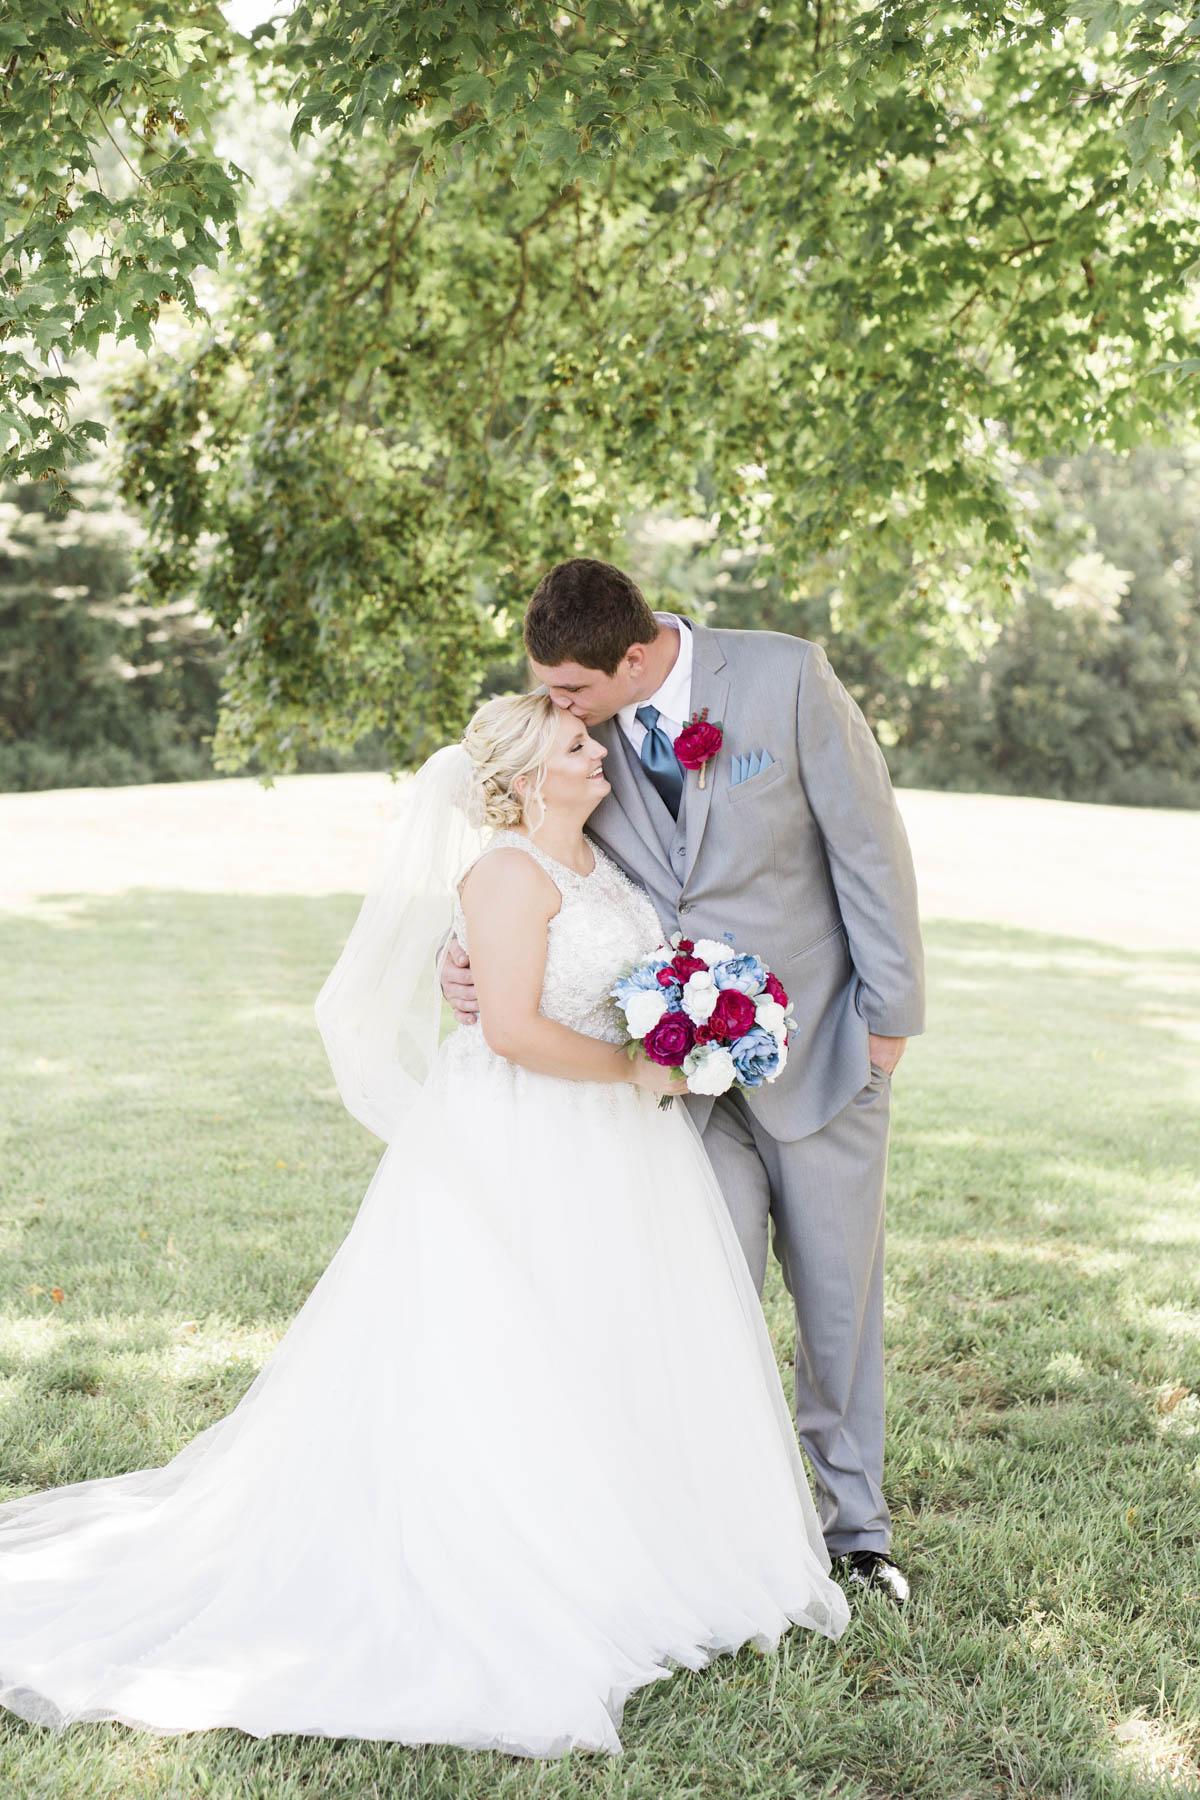 shotbychelsea_wedding_photography_blog-10.jpg